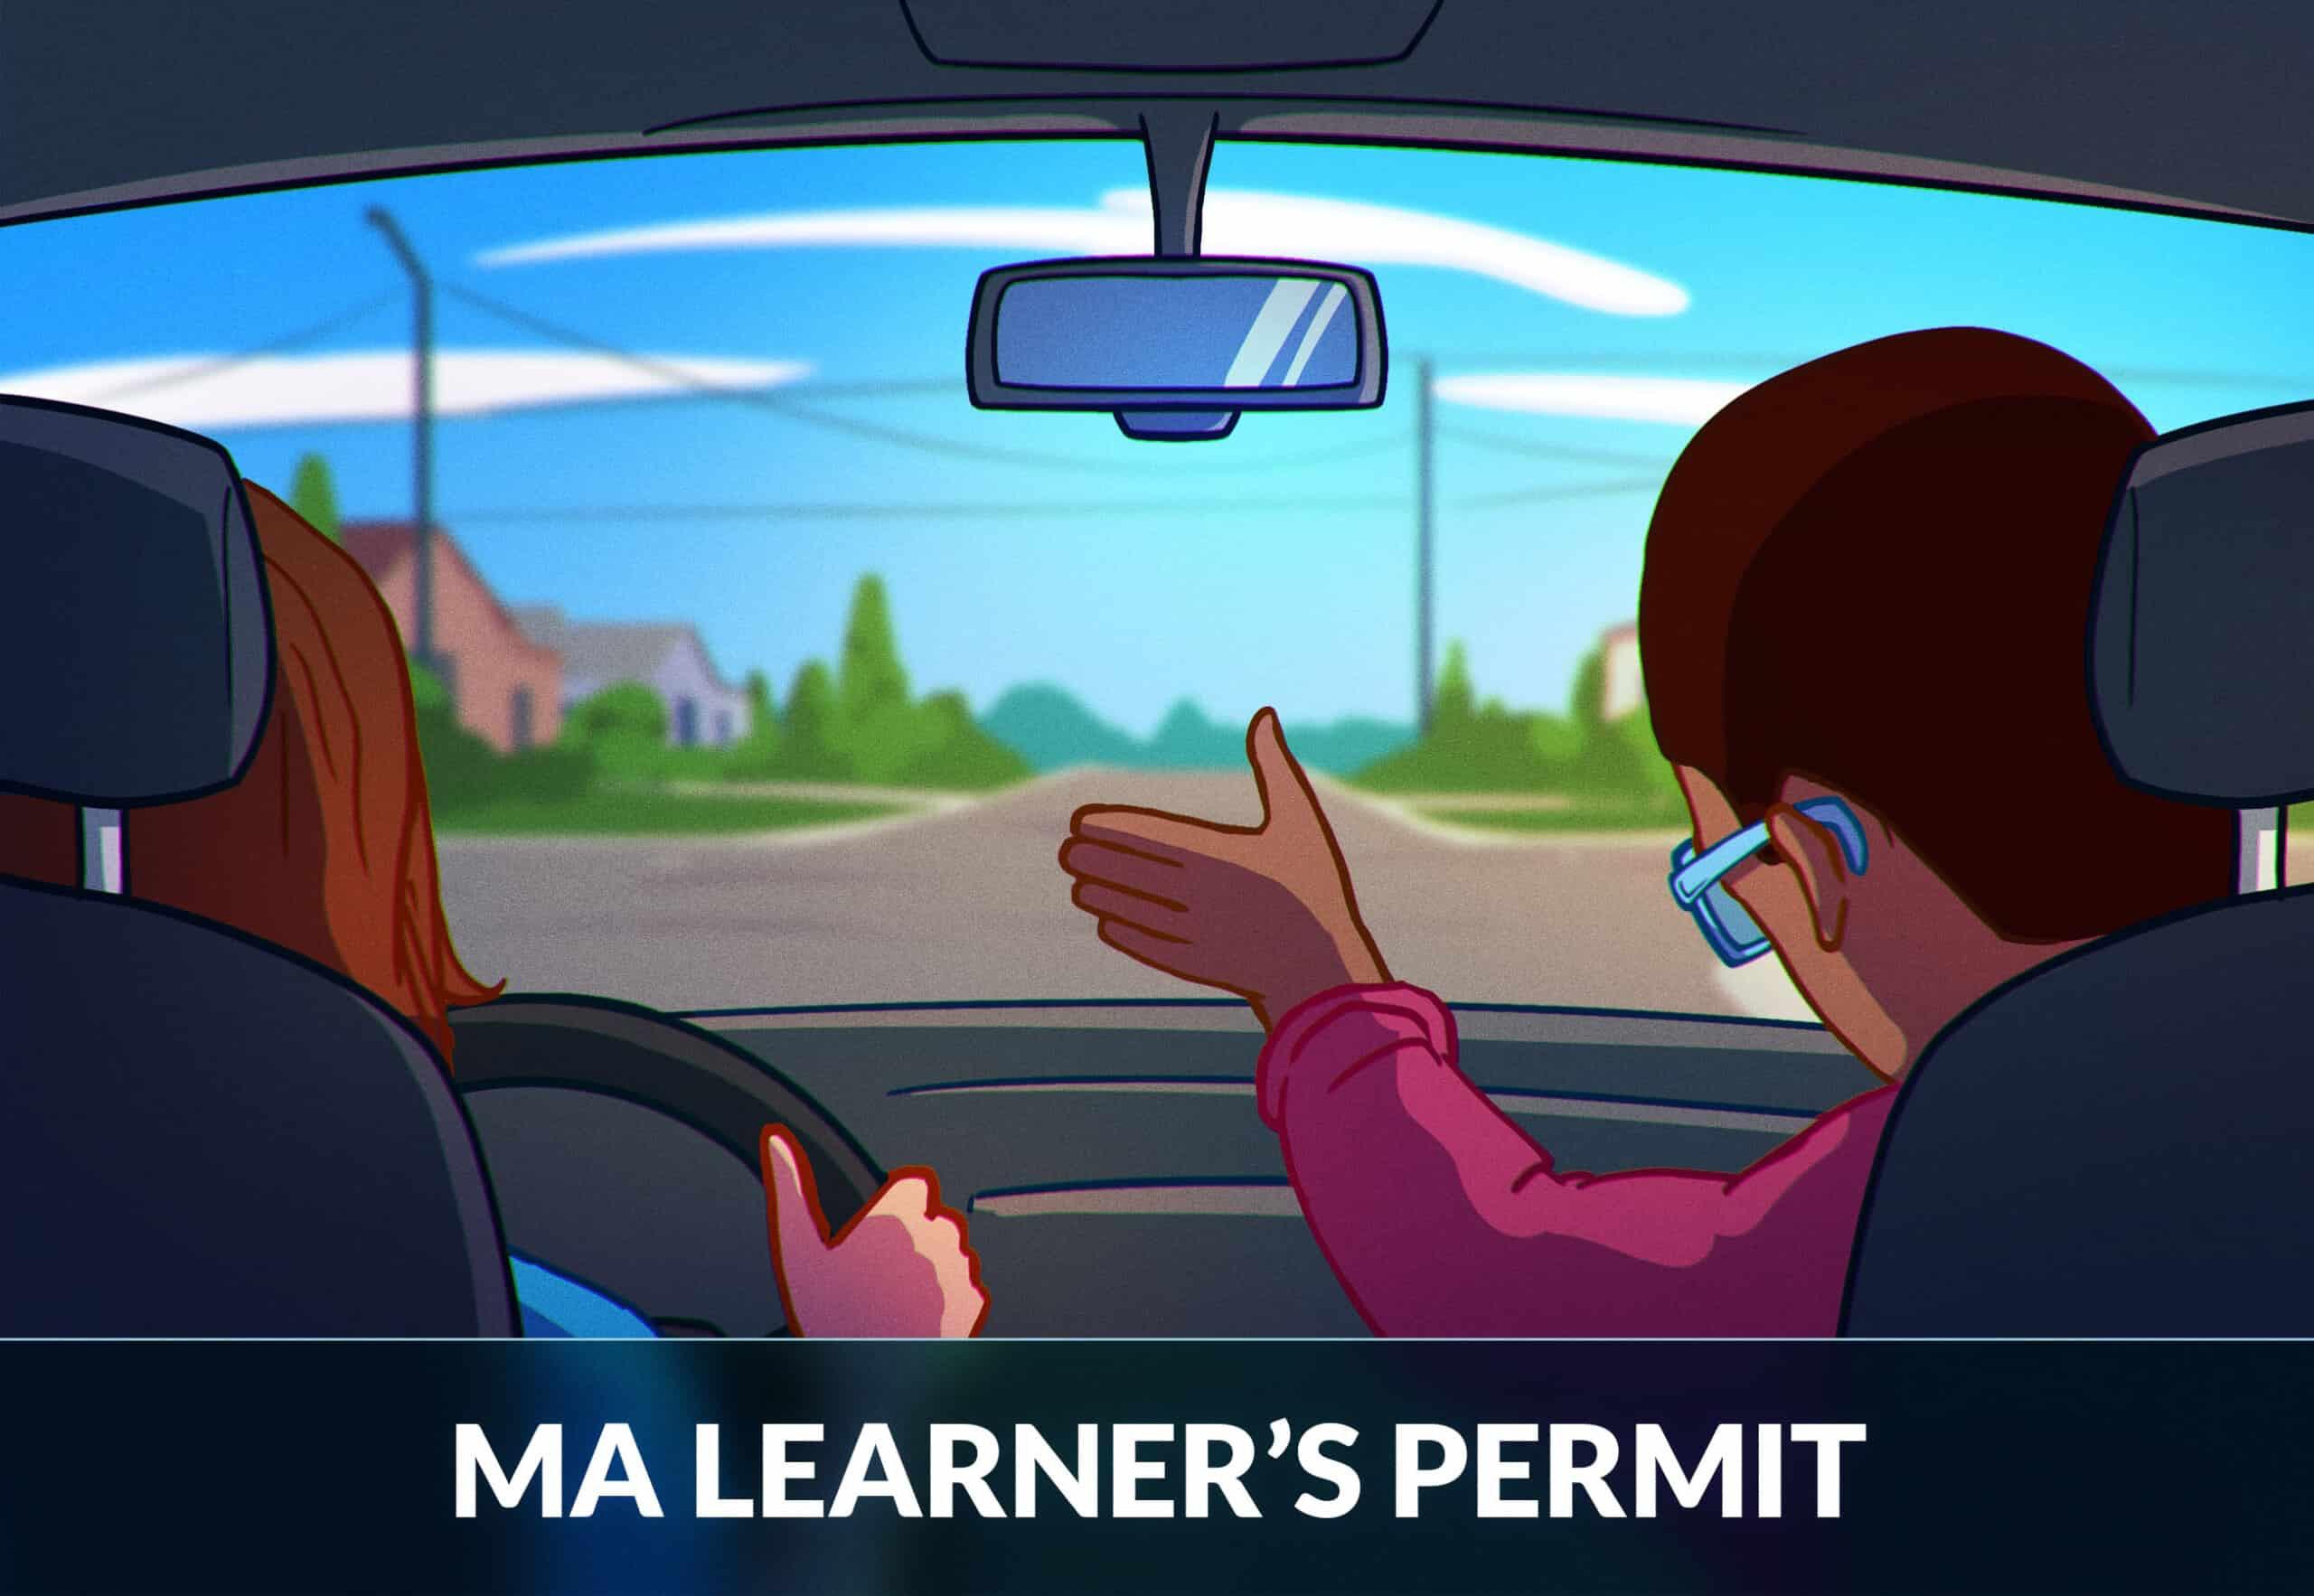 Massachusetts (MA) Learner's Permit